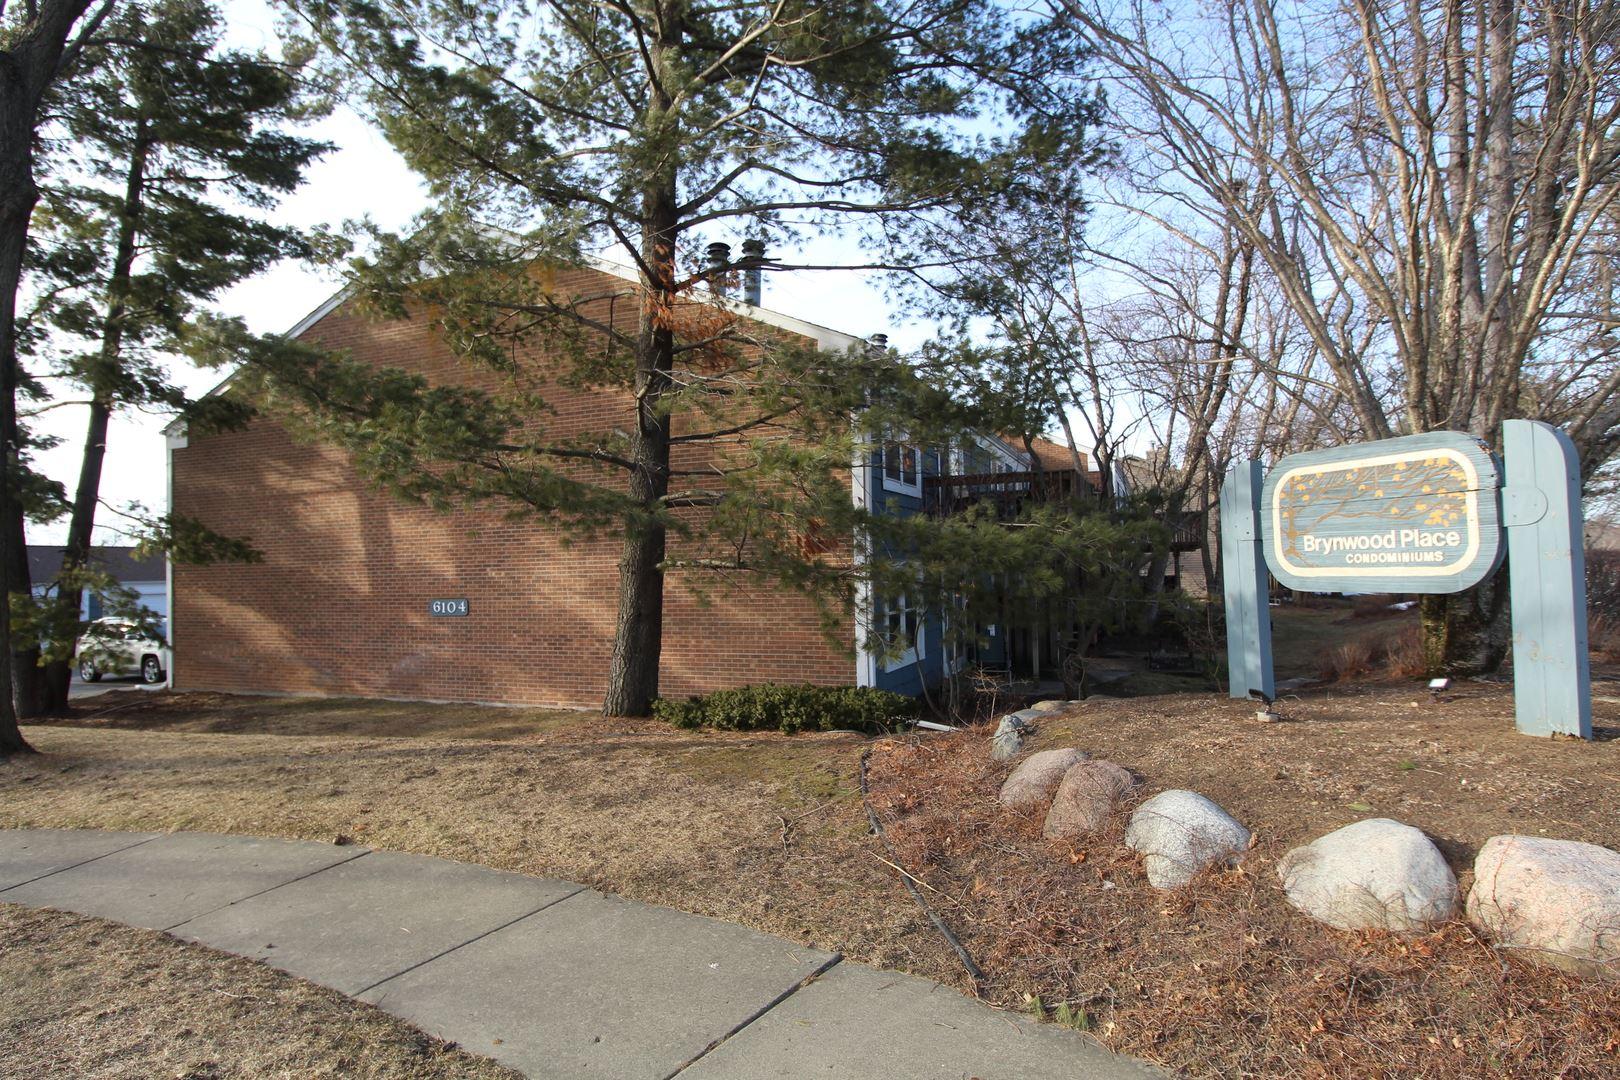 6104 Brynwood Drive #1, Rockford, IL 61114 - #: 11015599